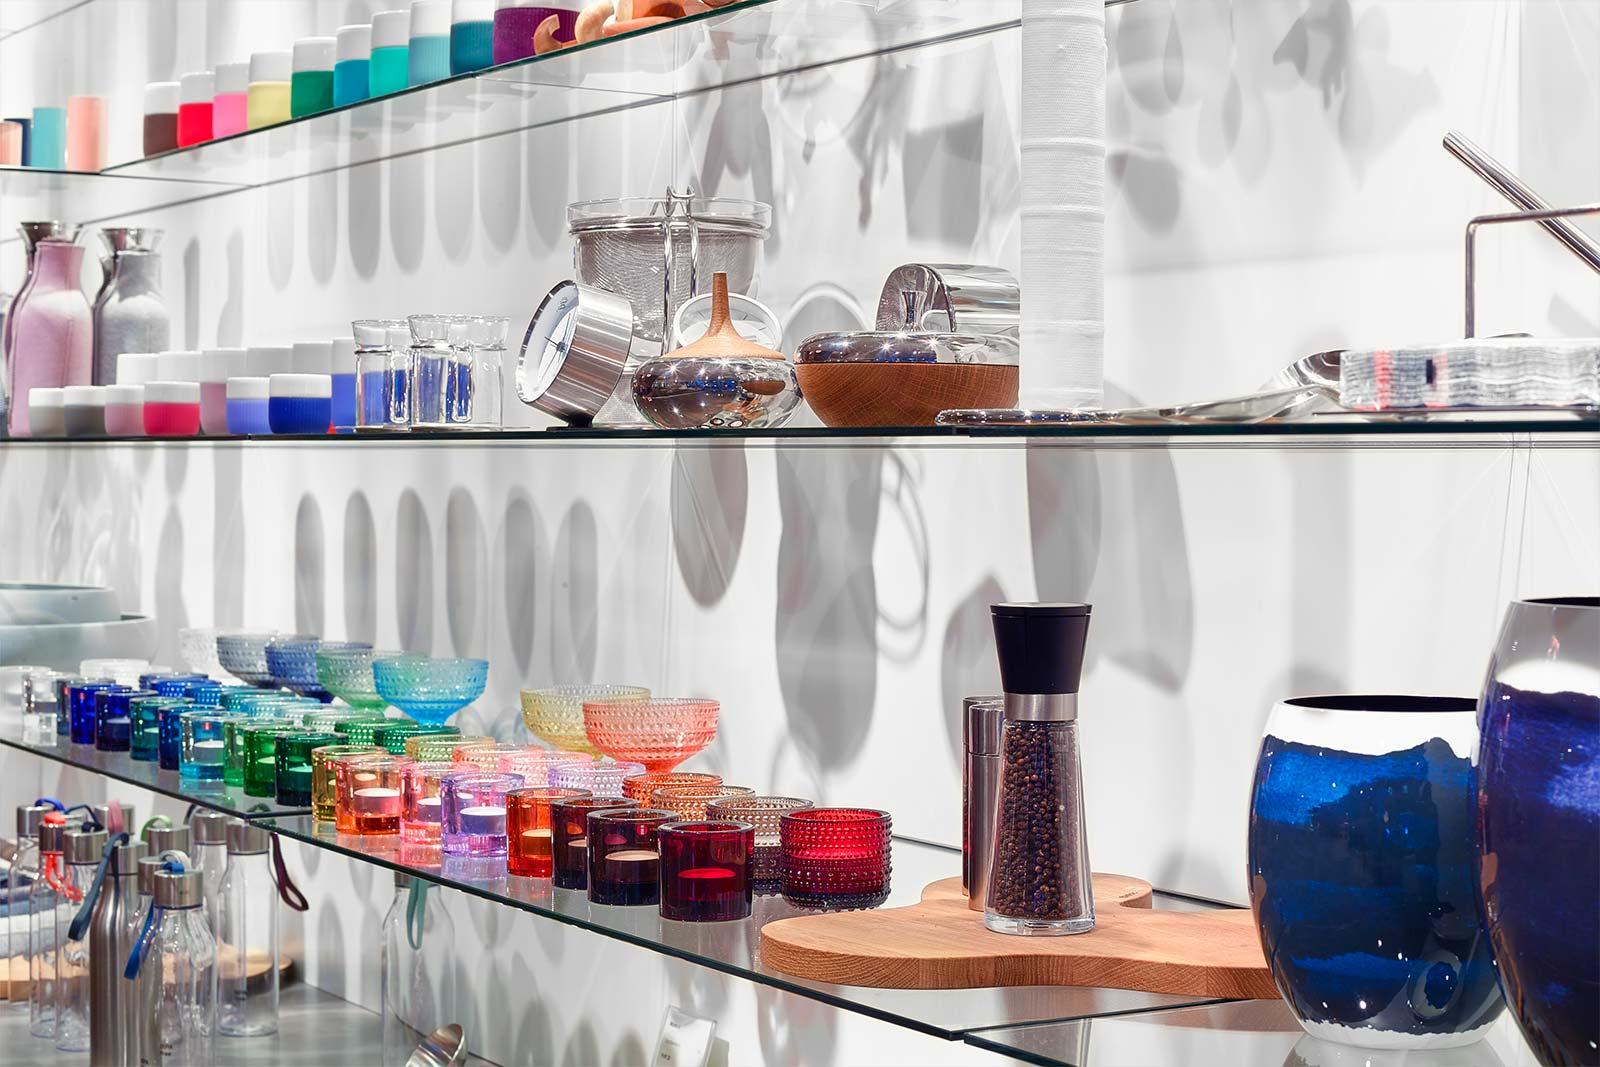 Online-Shop, Webshop, Boutique Danoise Basel Daenische Designer Moebel Accessoires Wohnen Onlineshop